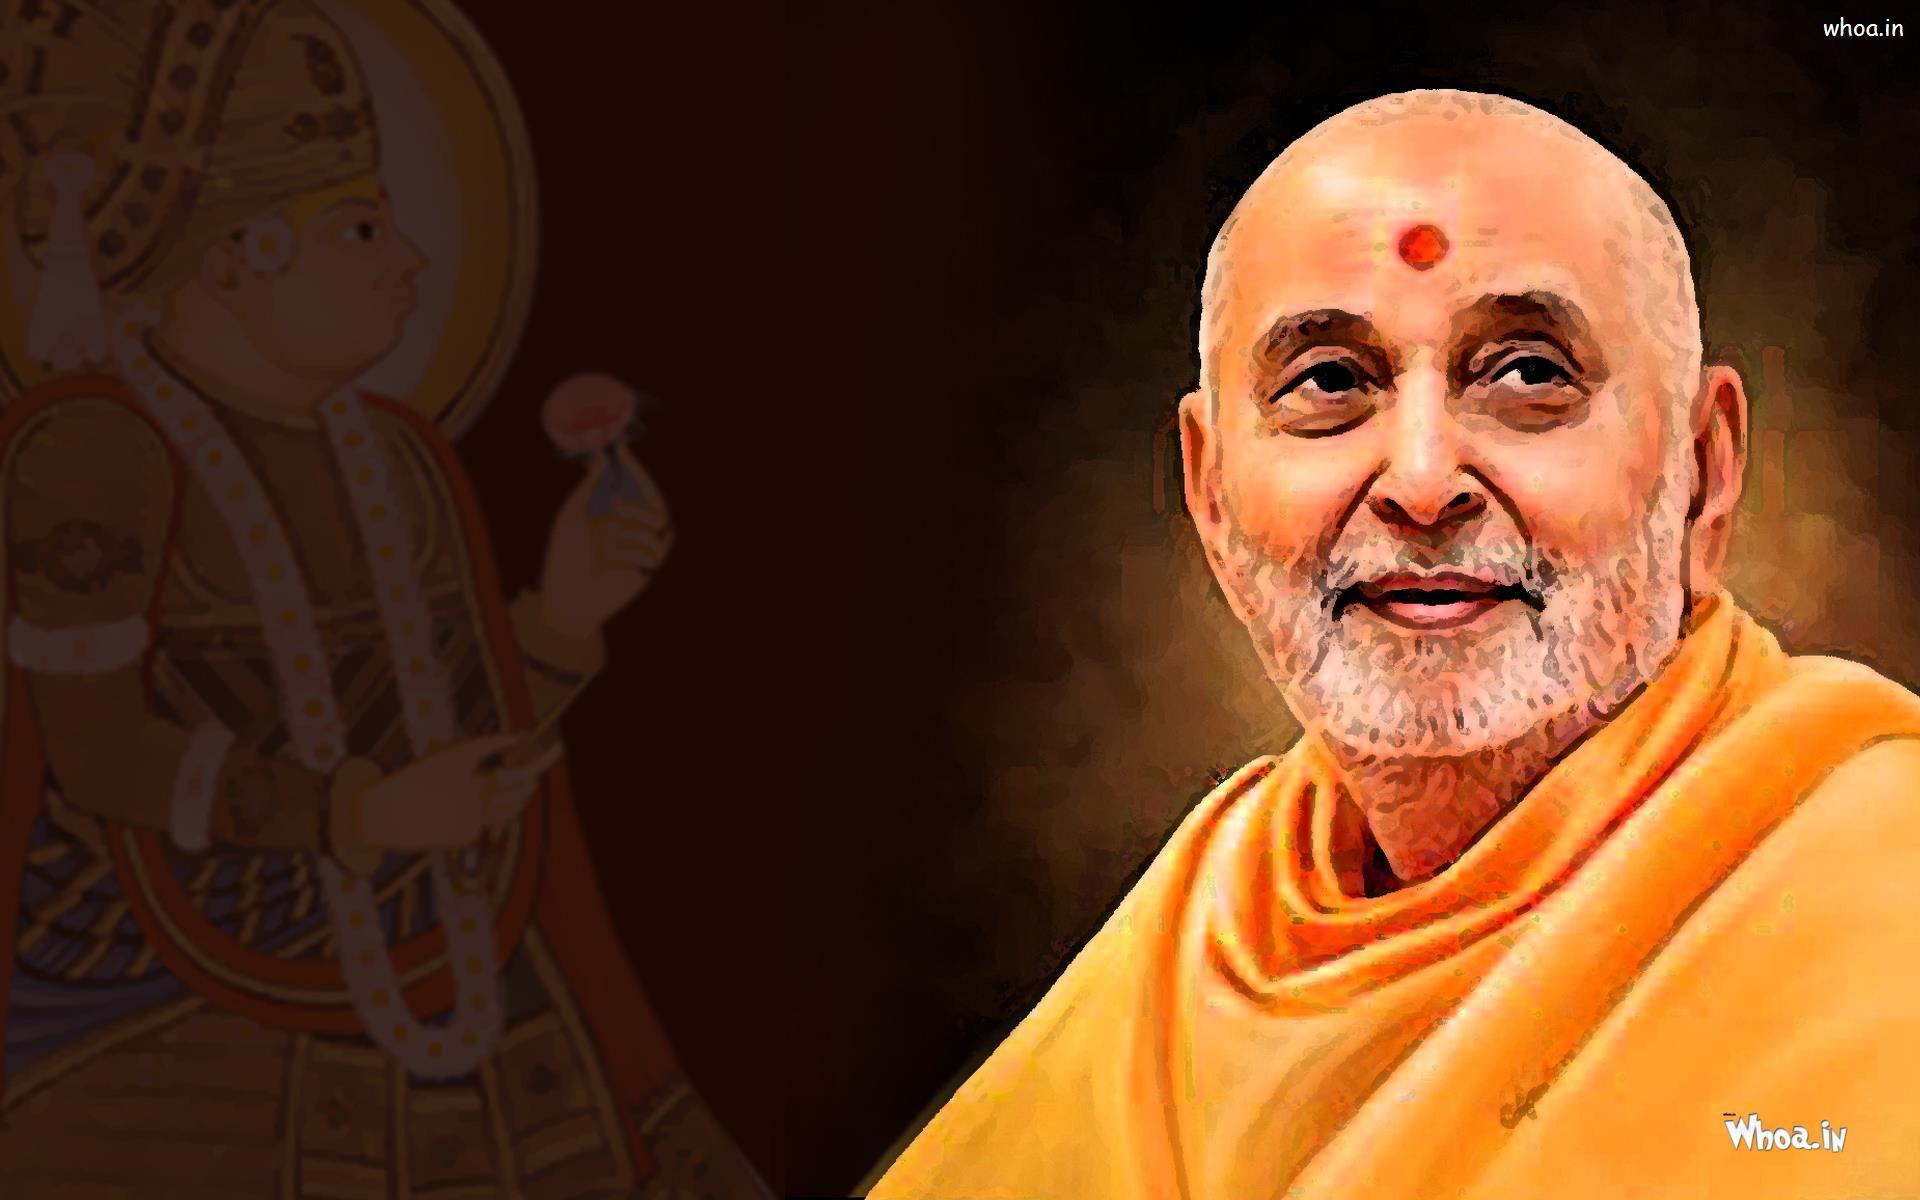 Pramukh-Swami-with-Lord-Swaminarayan-Wallpaper